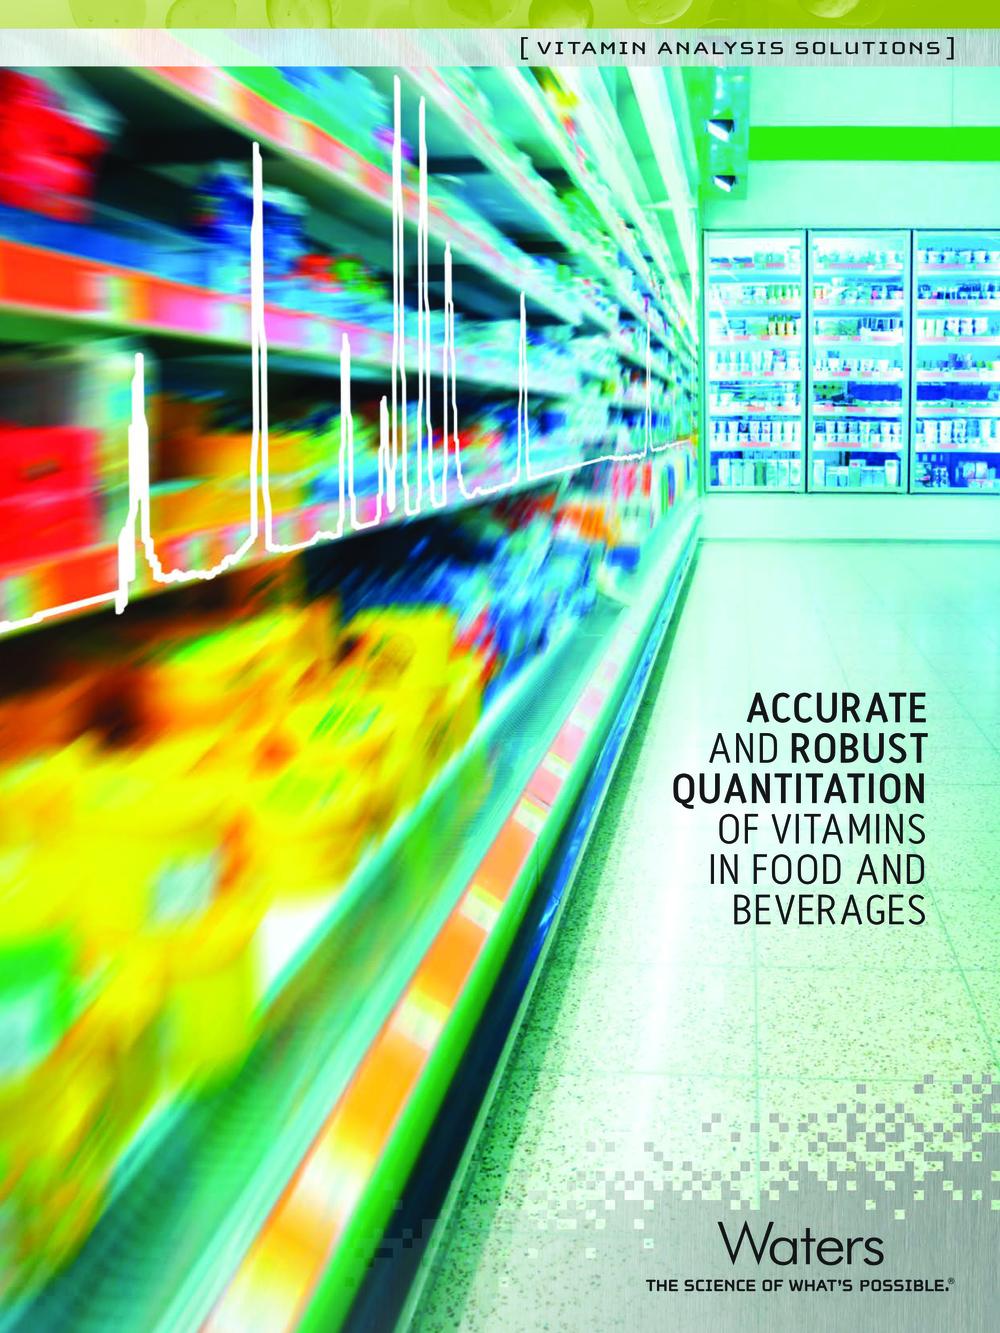 Vitamin Analysis Solutions Brochure